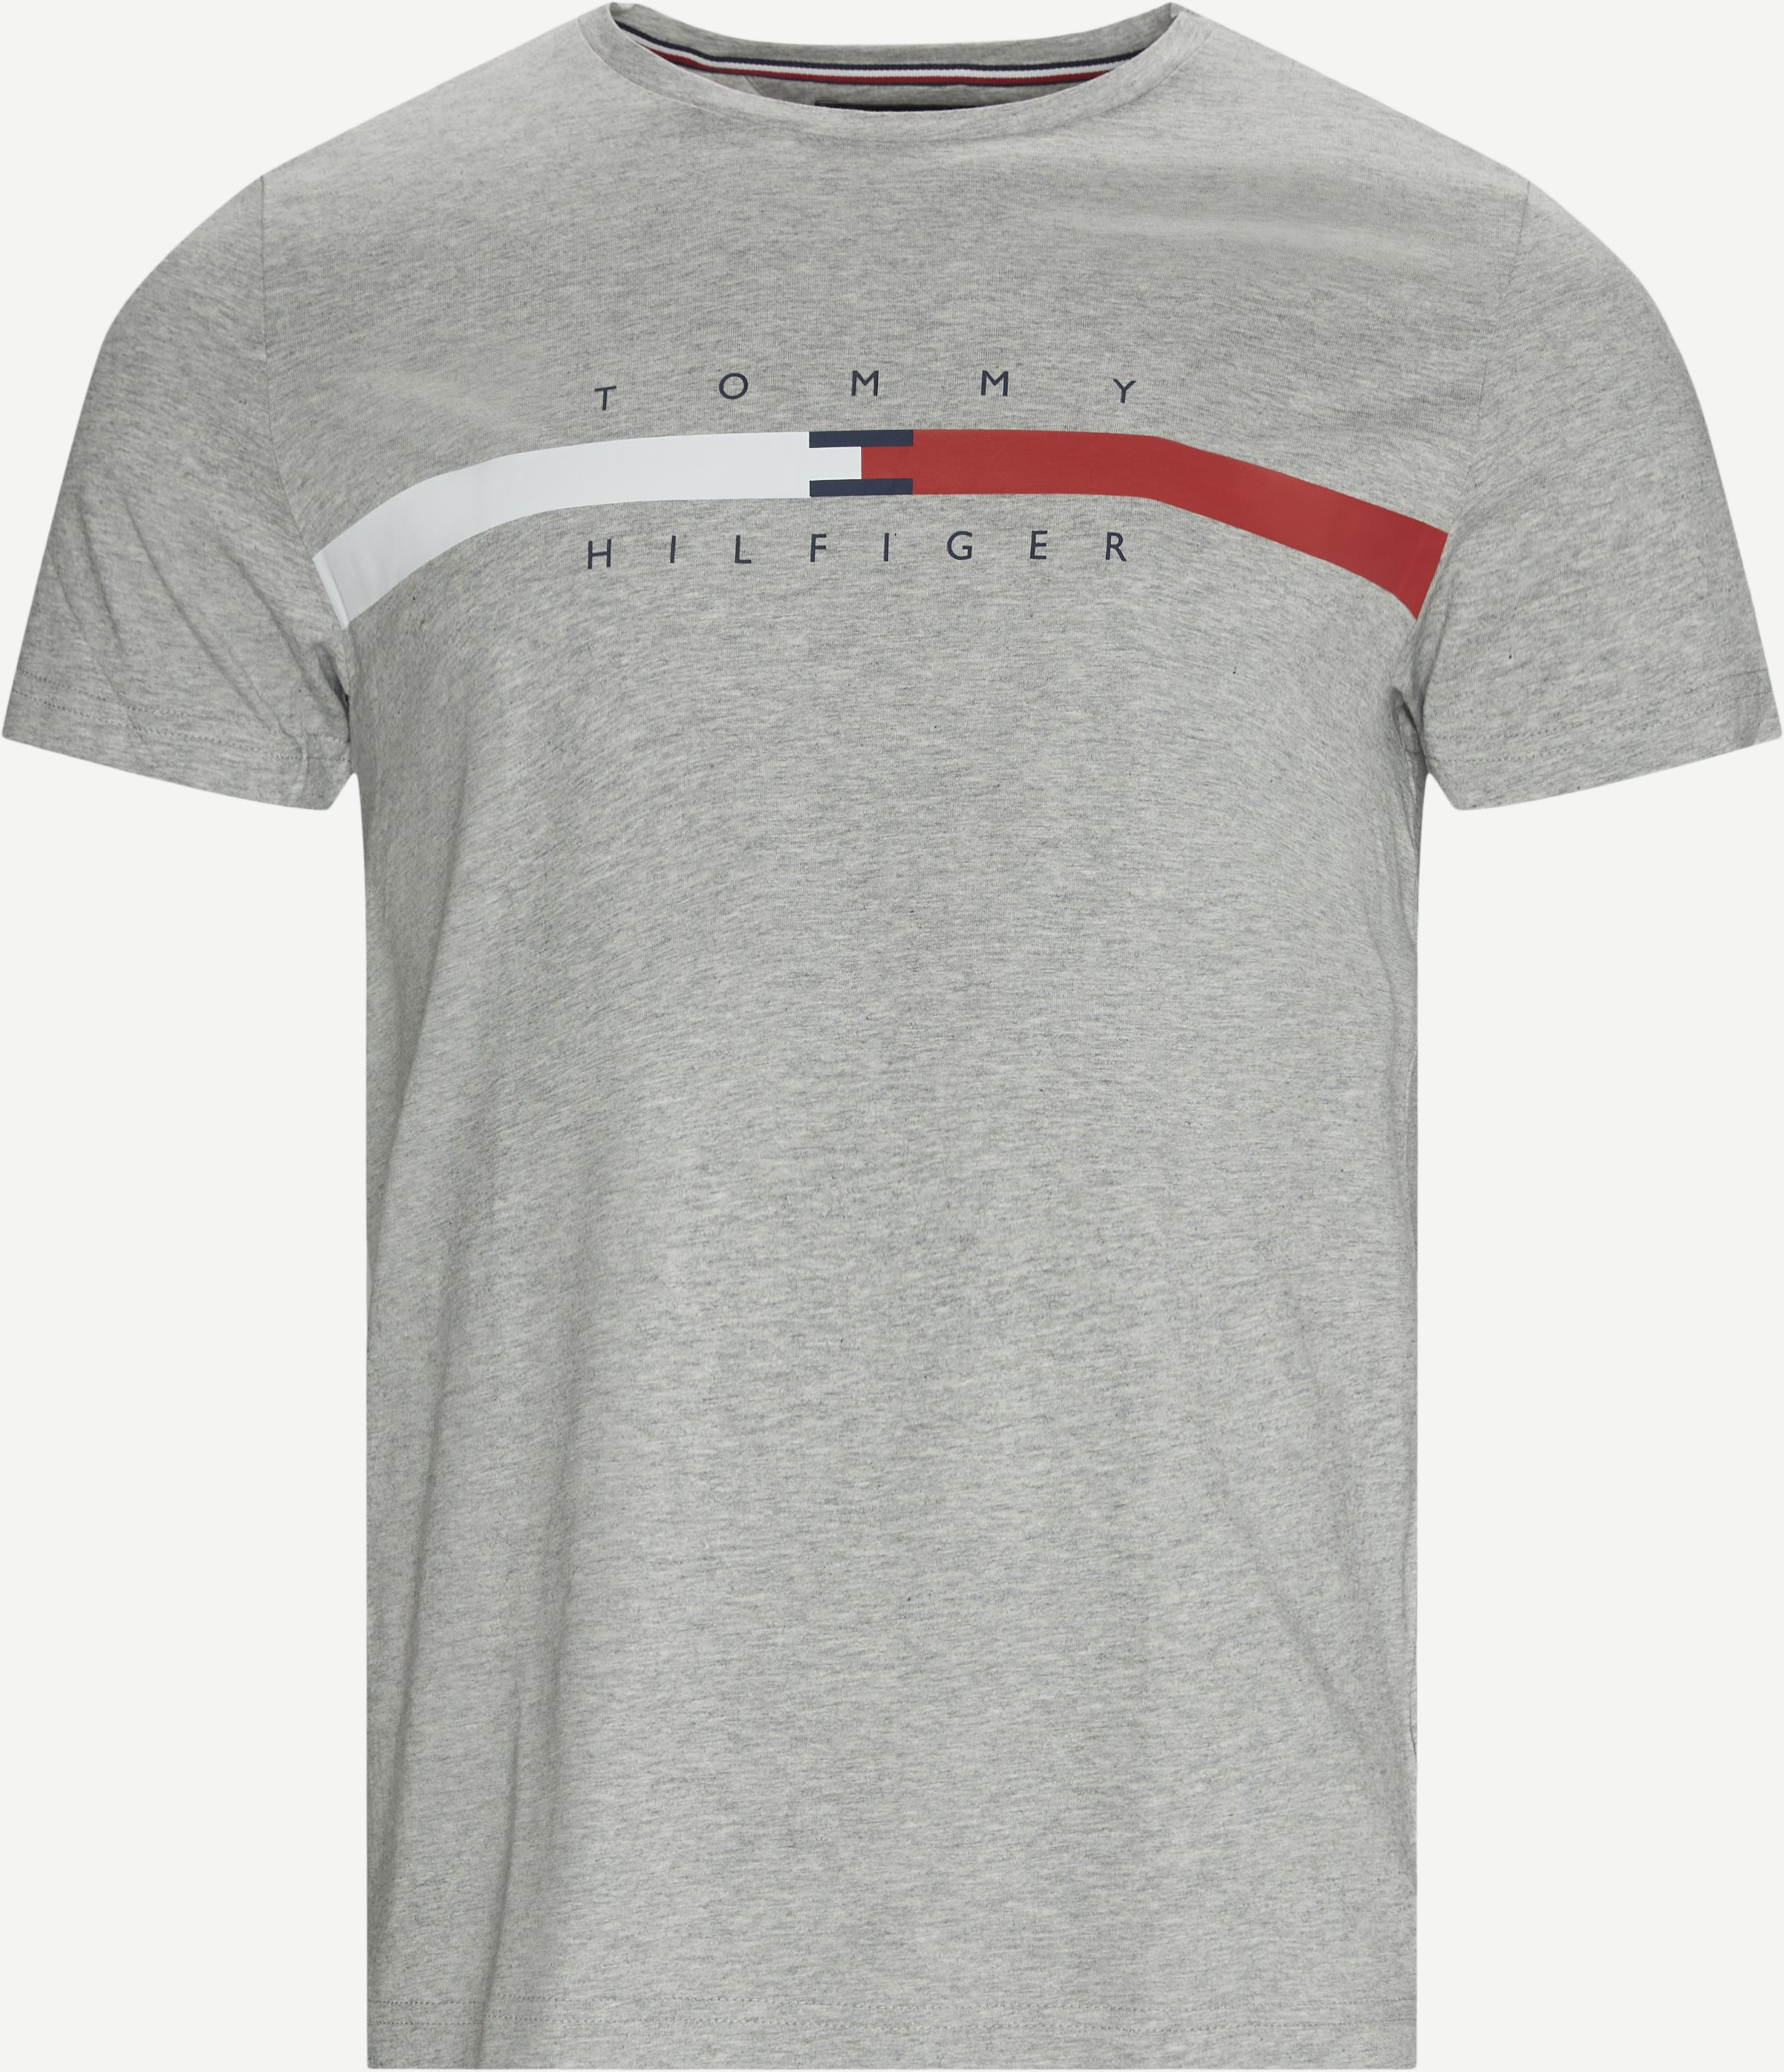 Global Stripe Chest T-shirt - T-shirts - Regular - Grey